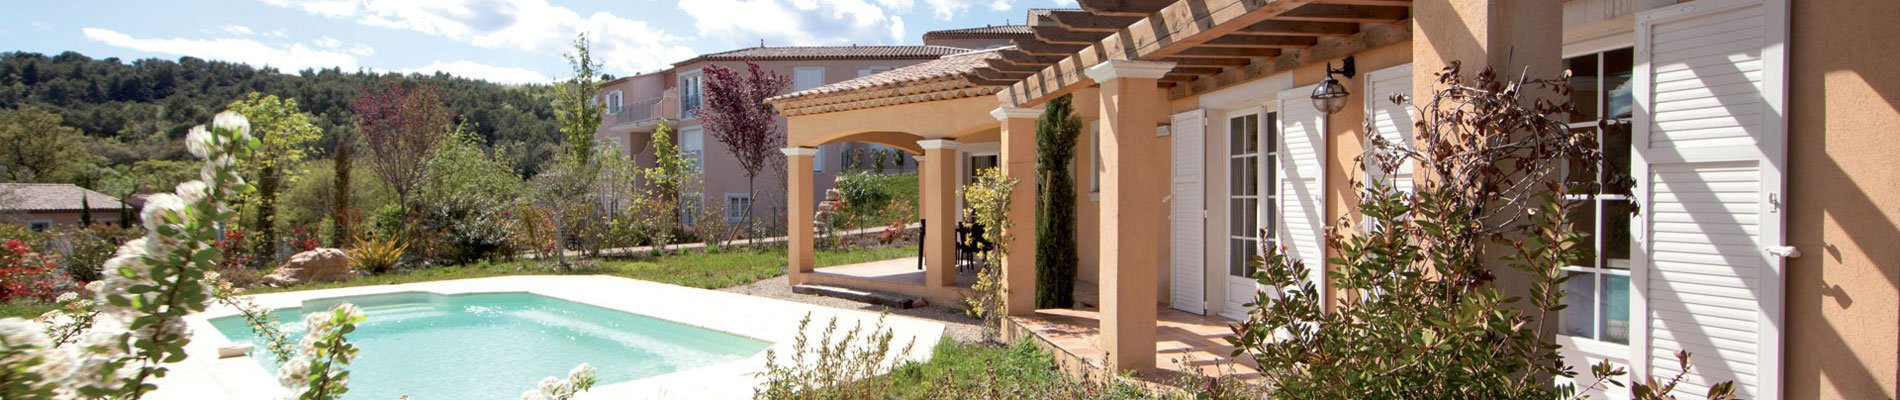 Villas Ch�teau de Camiole